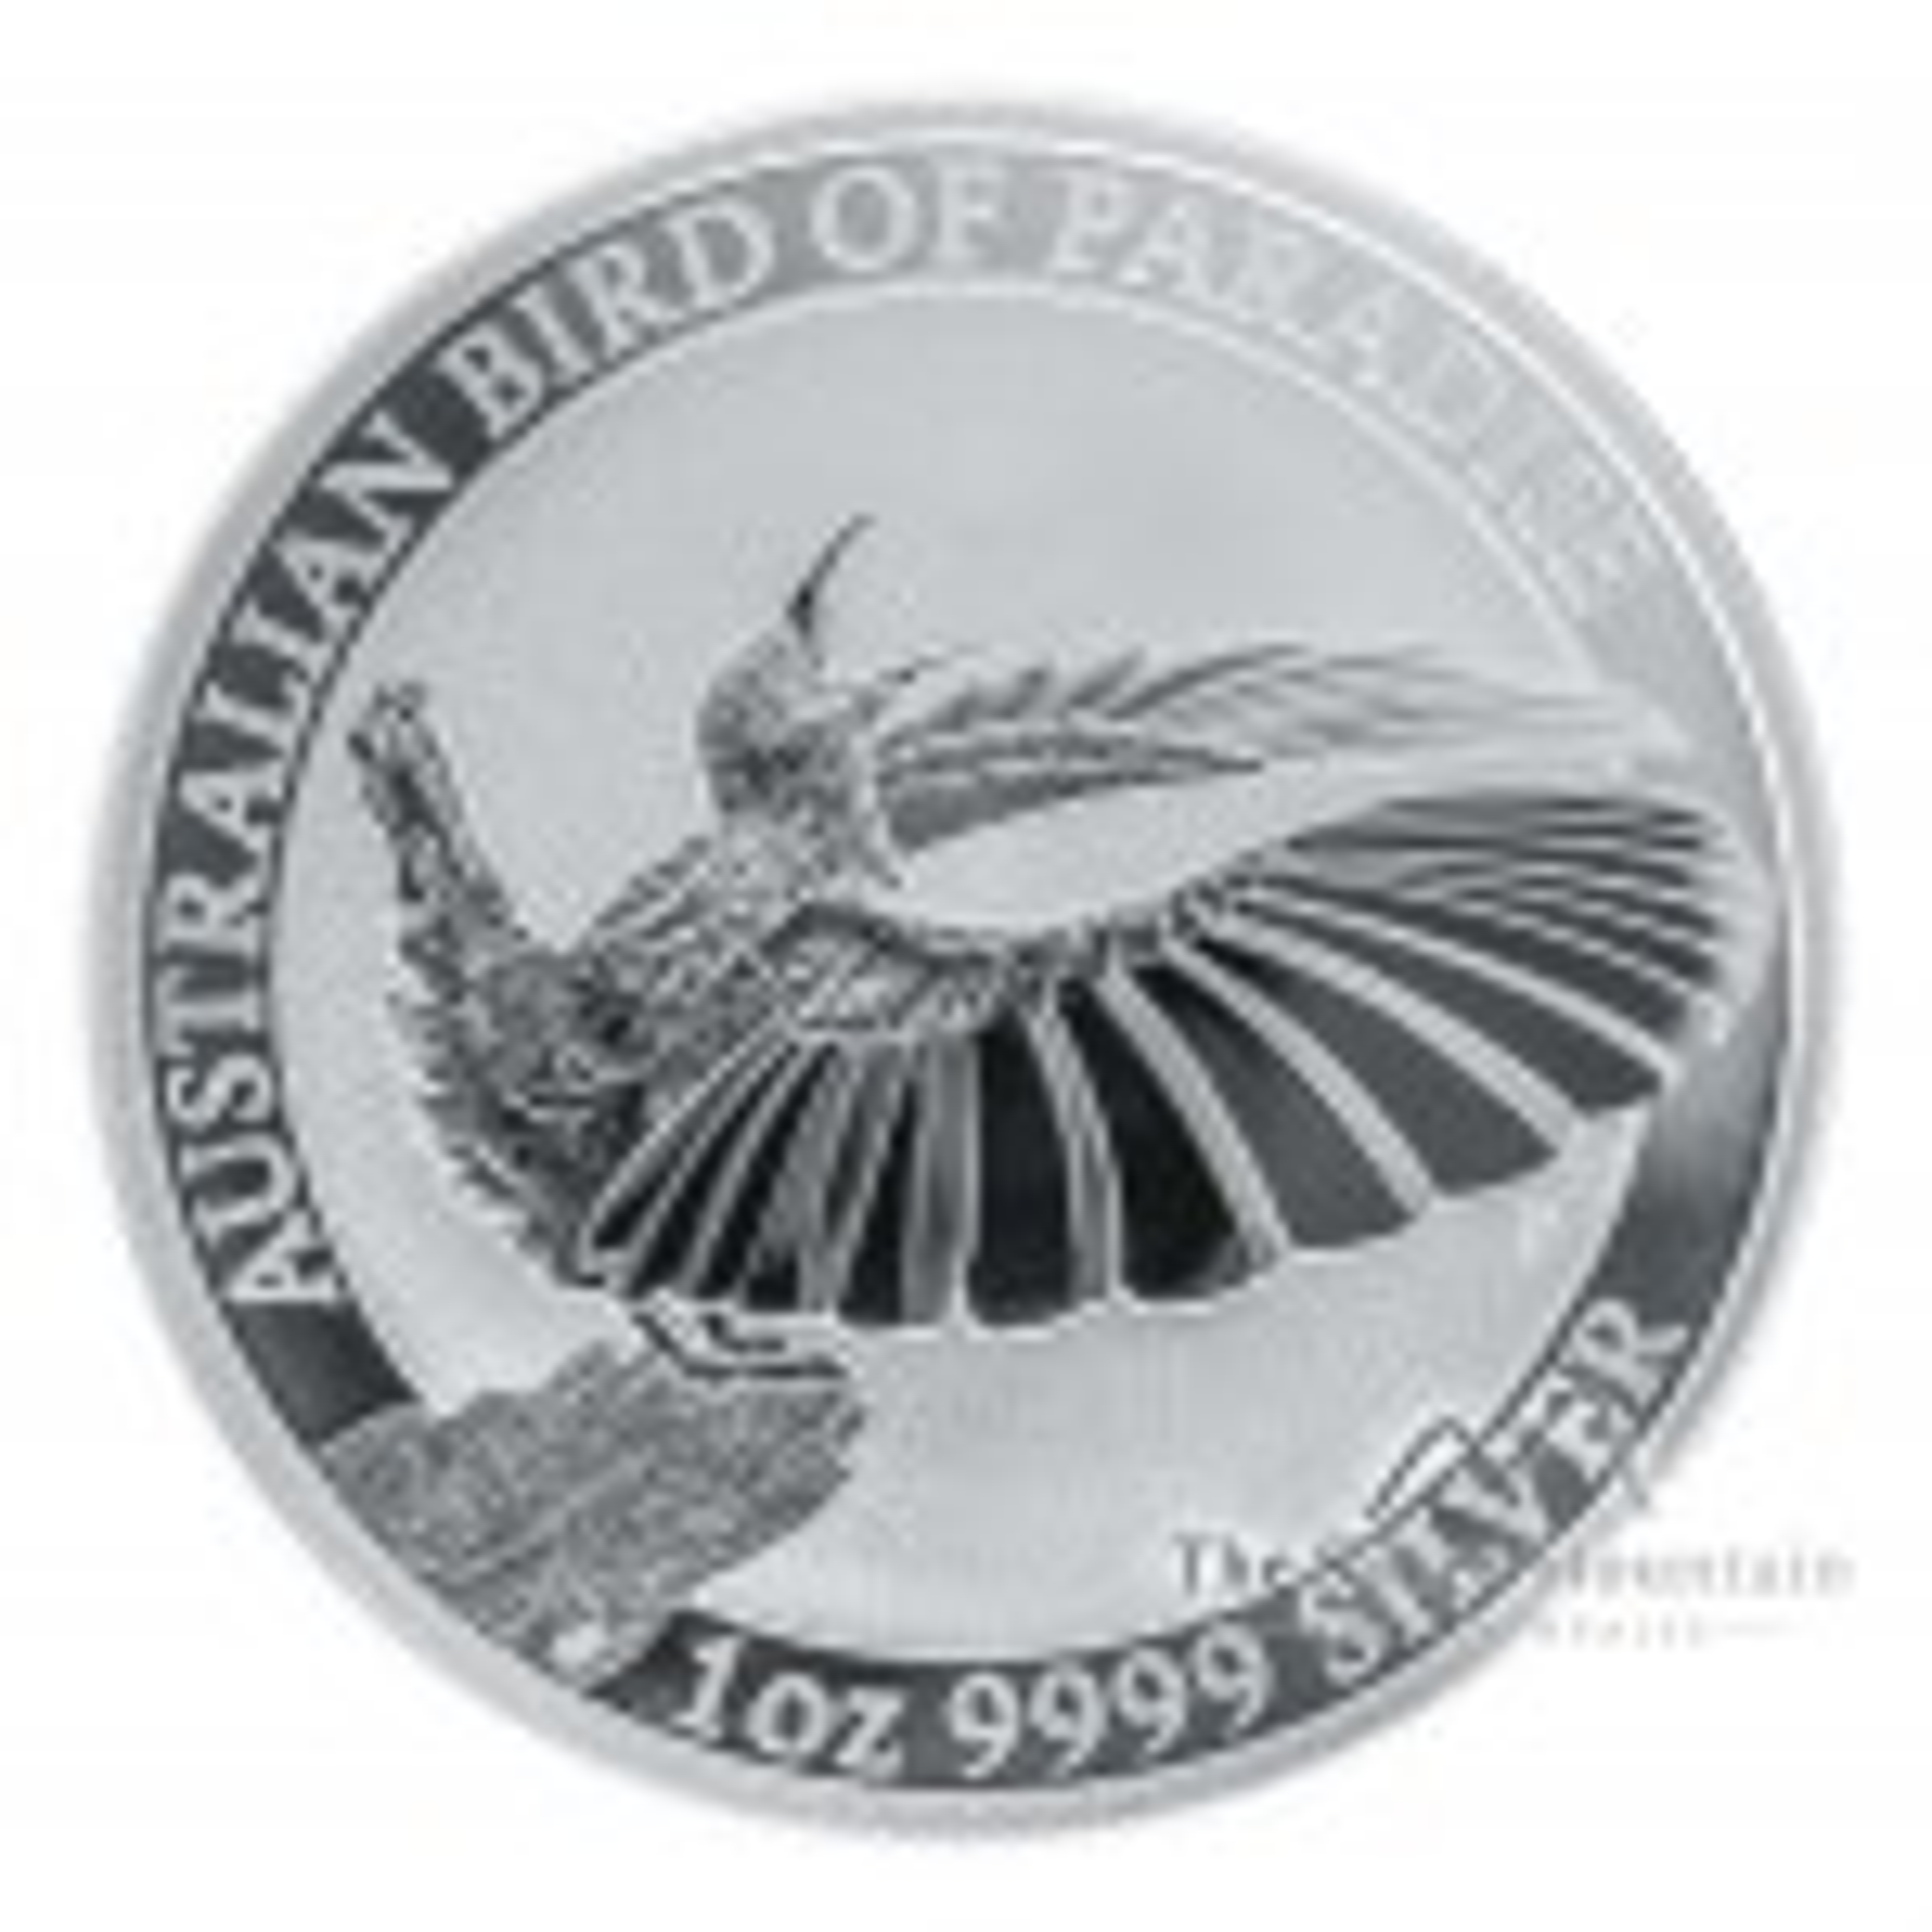 1 Troy ounce zilveren munt Birds of Paradise - Victoria's Riflebird